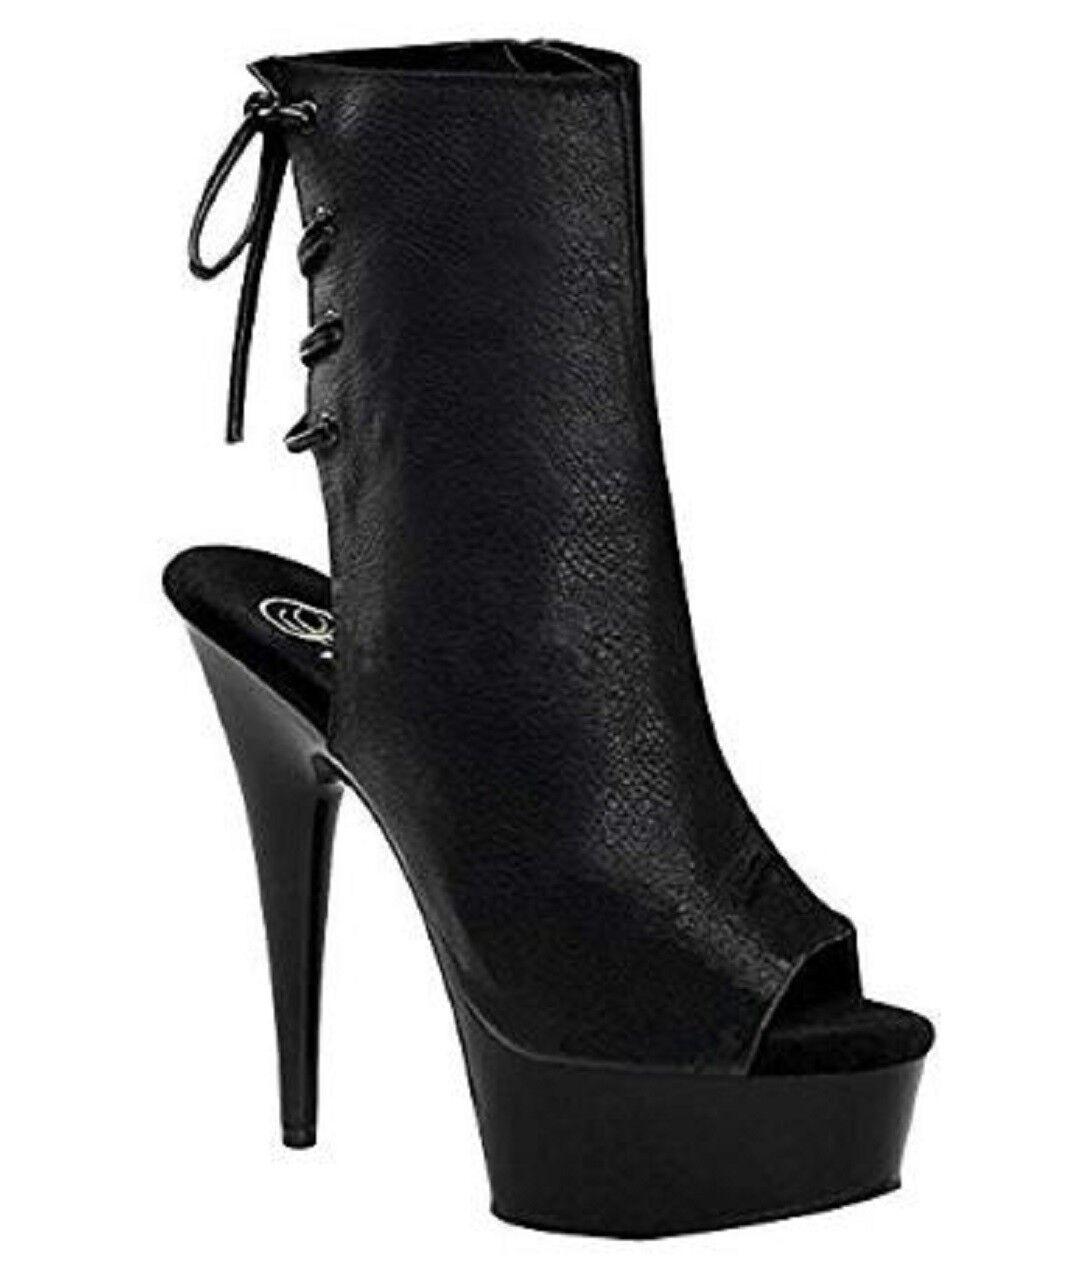 Pleaser DELIGHT-1018 Clubwear, Exotic Dancing, 6  Platform Ankle Boots Blk Faux.